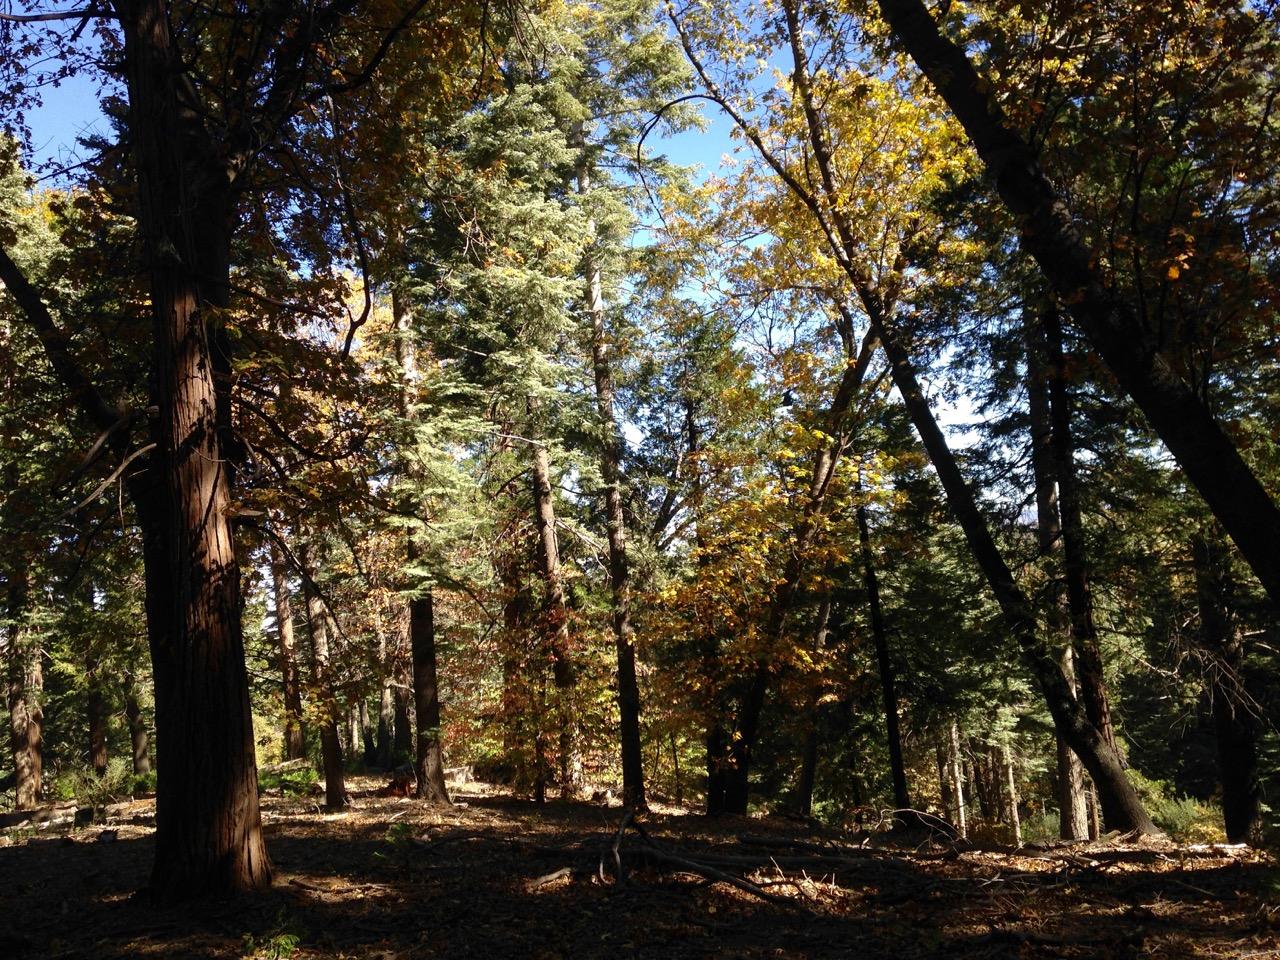 Dogwood Trail at Dogwood Campground near Lake Arrowhead, California